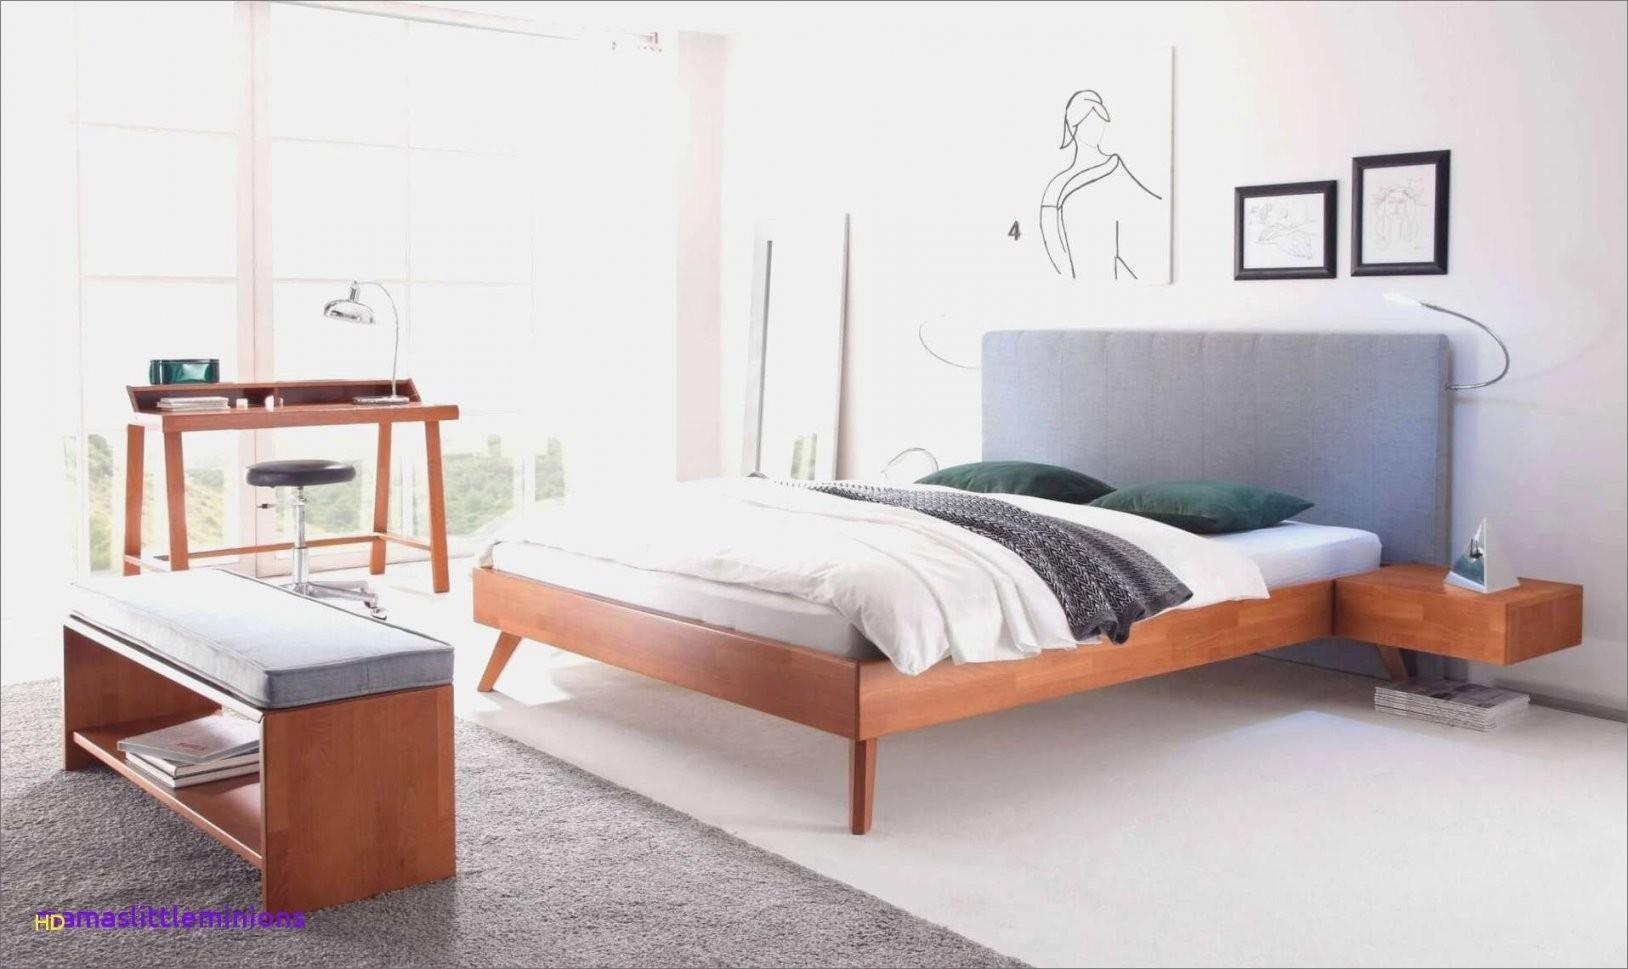 Weißes Bettgestell 140×200 Frisch Bett Landhausstil Weiß 180×200 von Bett Landhausstil Weiß 180X200 Bild